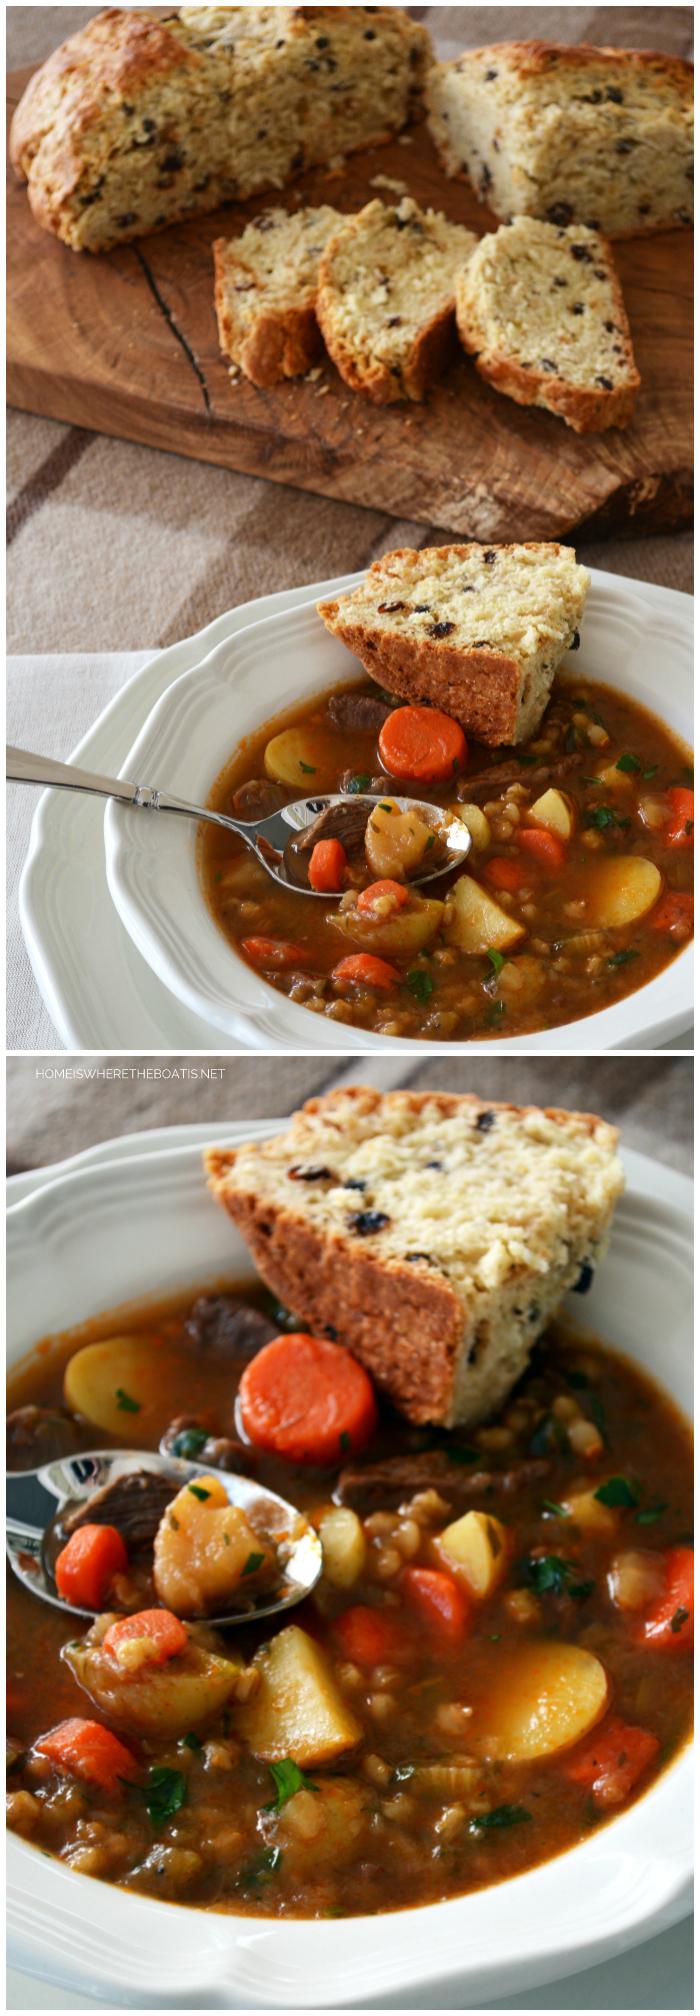 Irish Beef Stew with Irish Whiskey Soda Bread | ©homeiswheretheboatis.net #stpatricksday #recipe